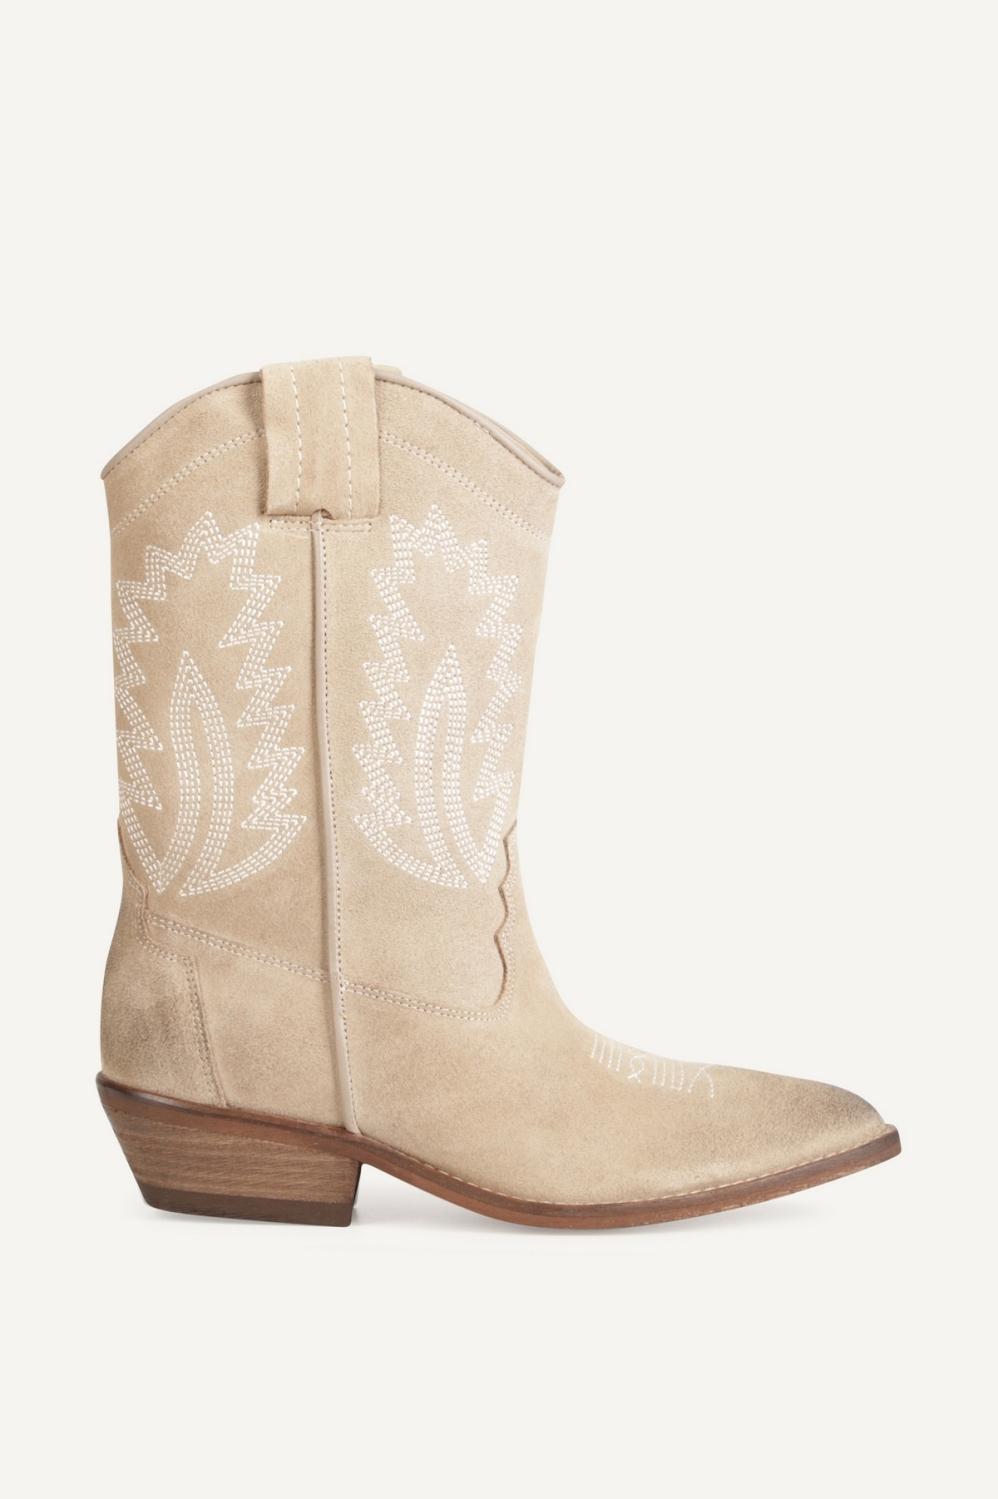 Shoecolate Beige 80.20.08.558